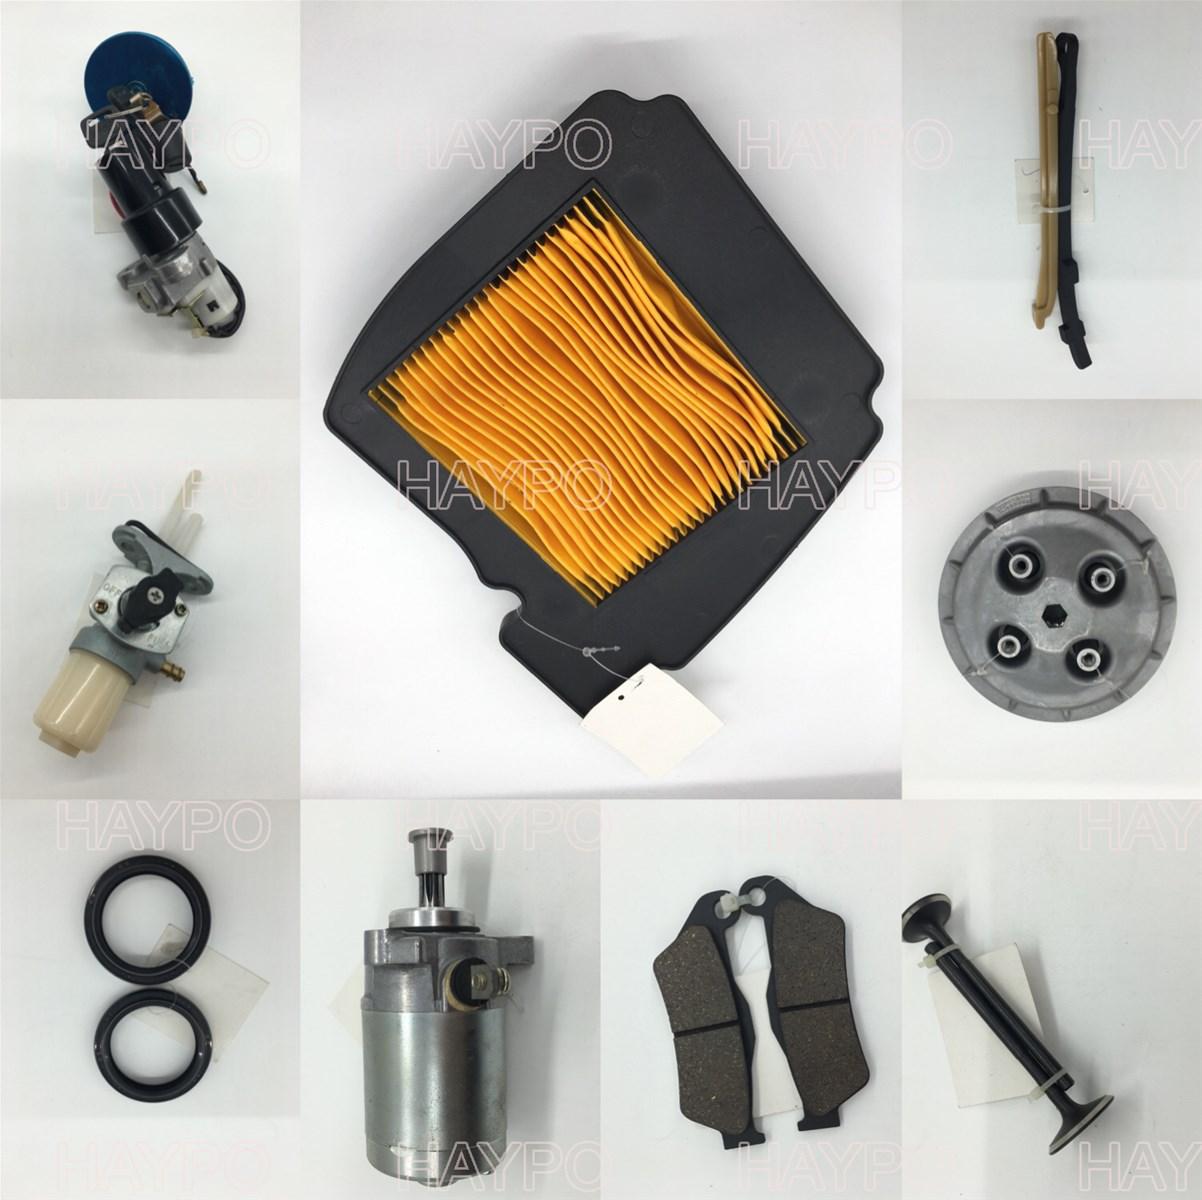 YAMAHA FZ16 Motorcycle Parts